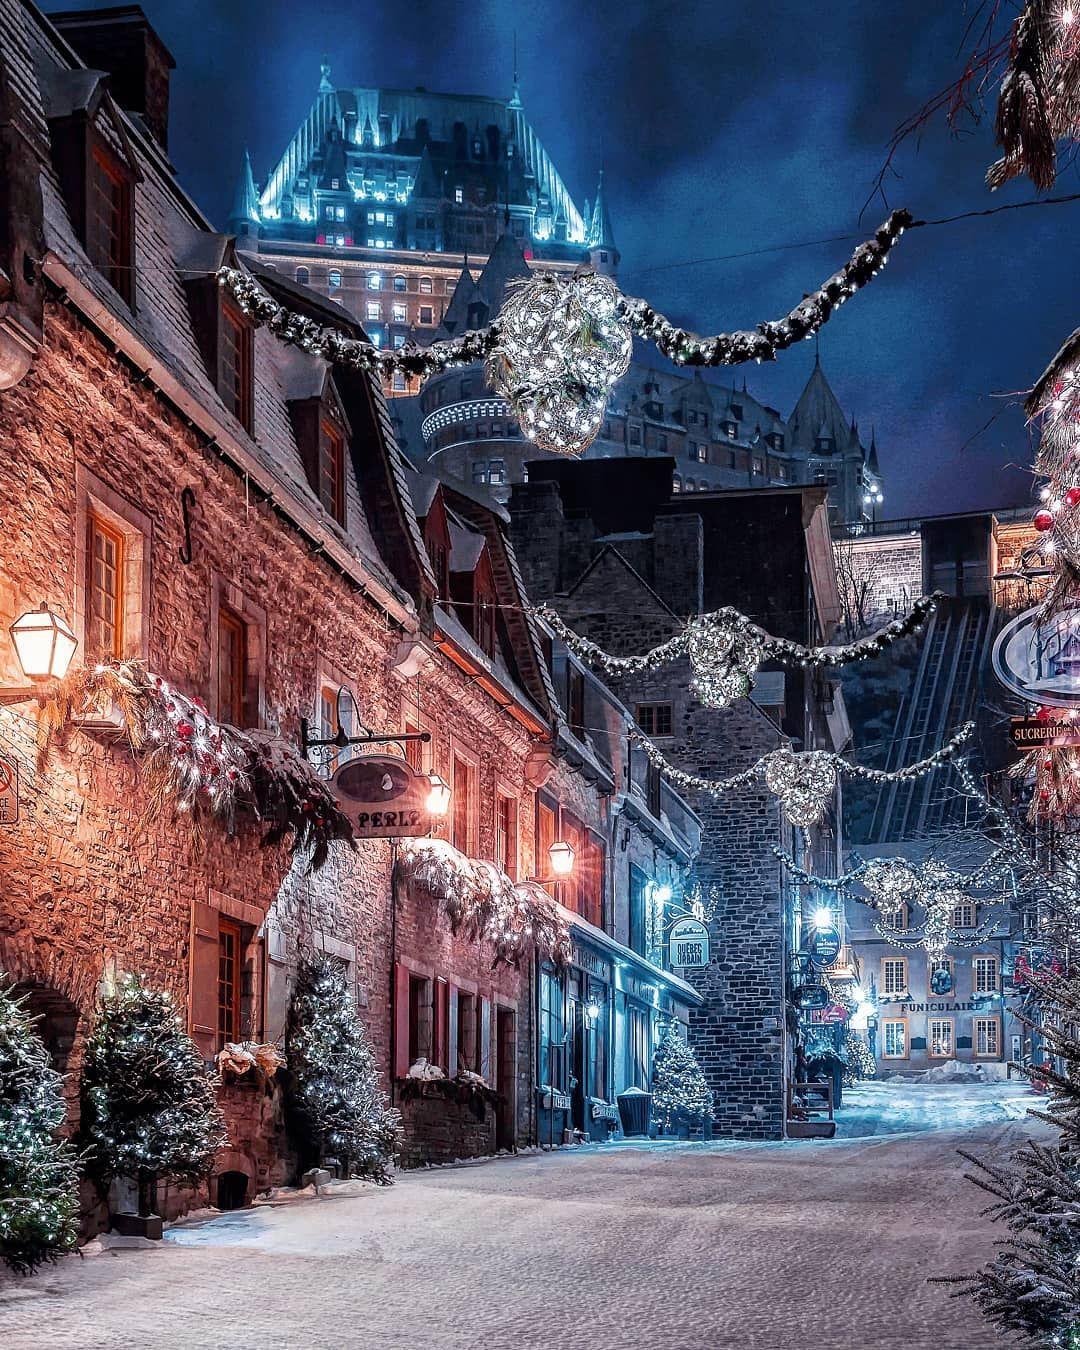 Quebec Canada Winter Scenery Winter Magic Winter Scenes